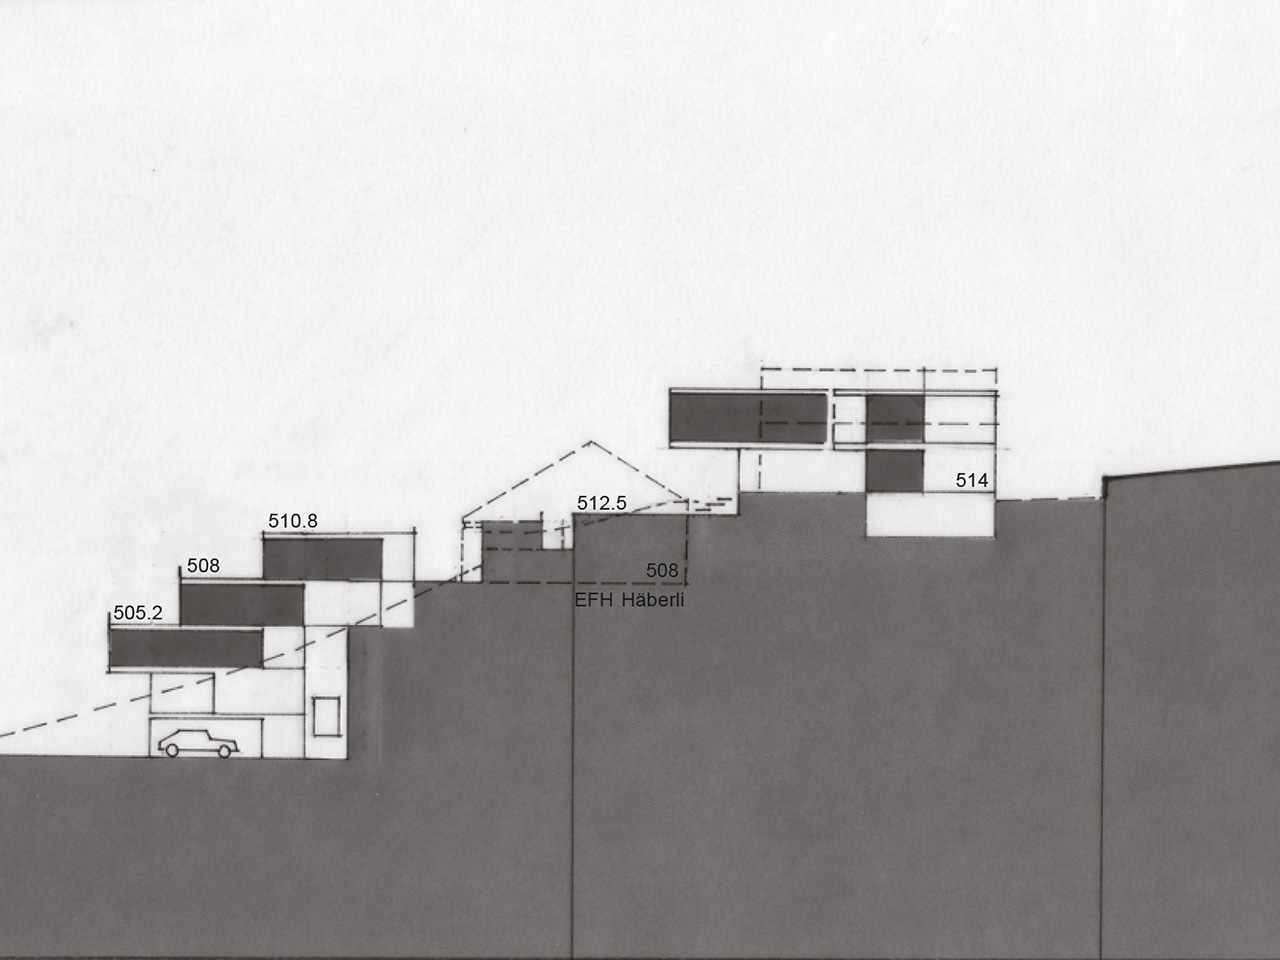 laubhus-architektur-mehrfamilienhaus-th-herrliberg-studie